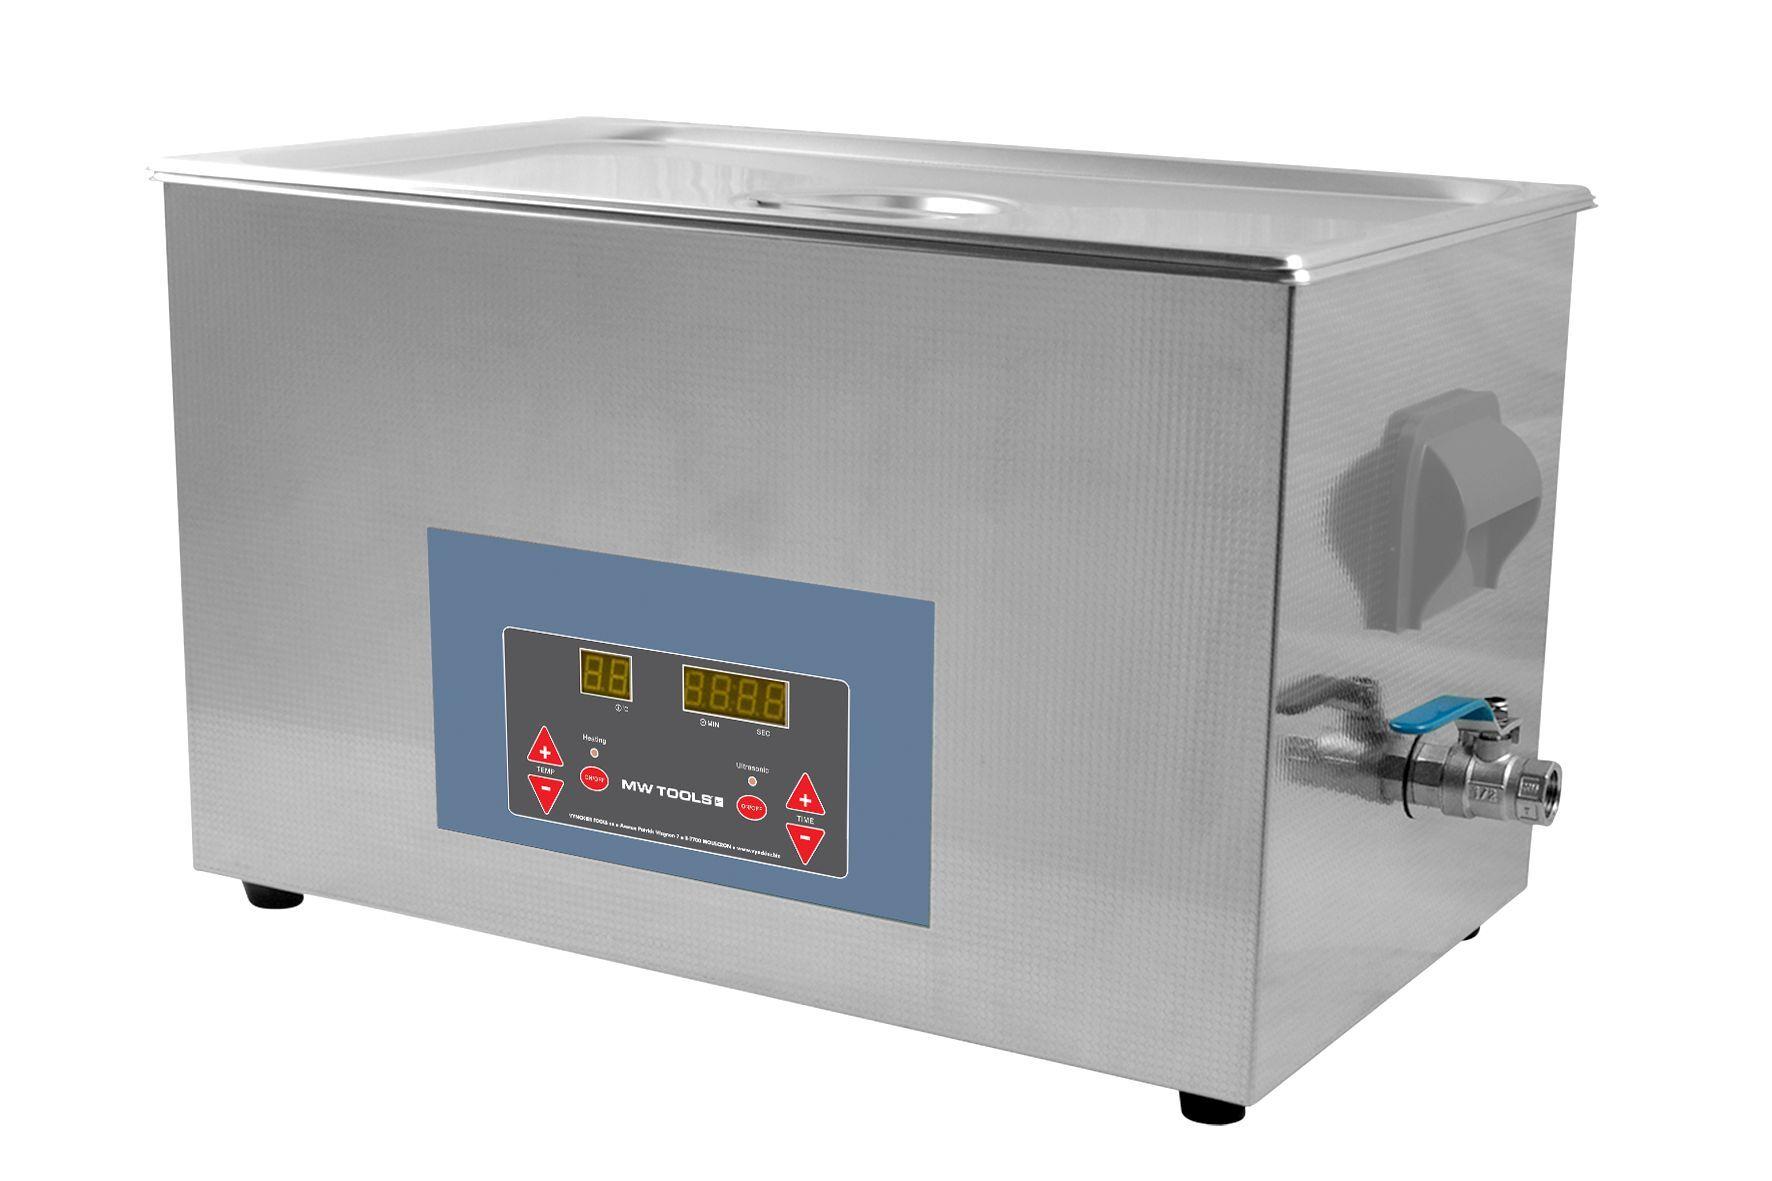 Mw-tools Nettoyeur à ultrasons 20 l MW-Tools UCC020